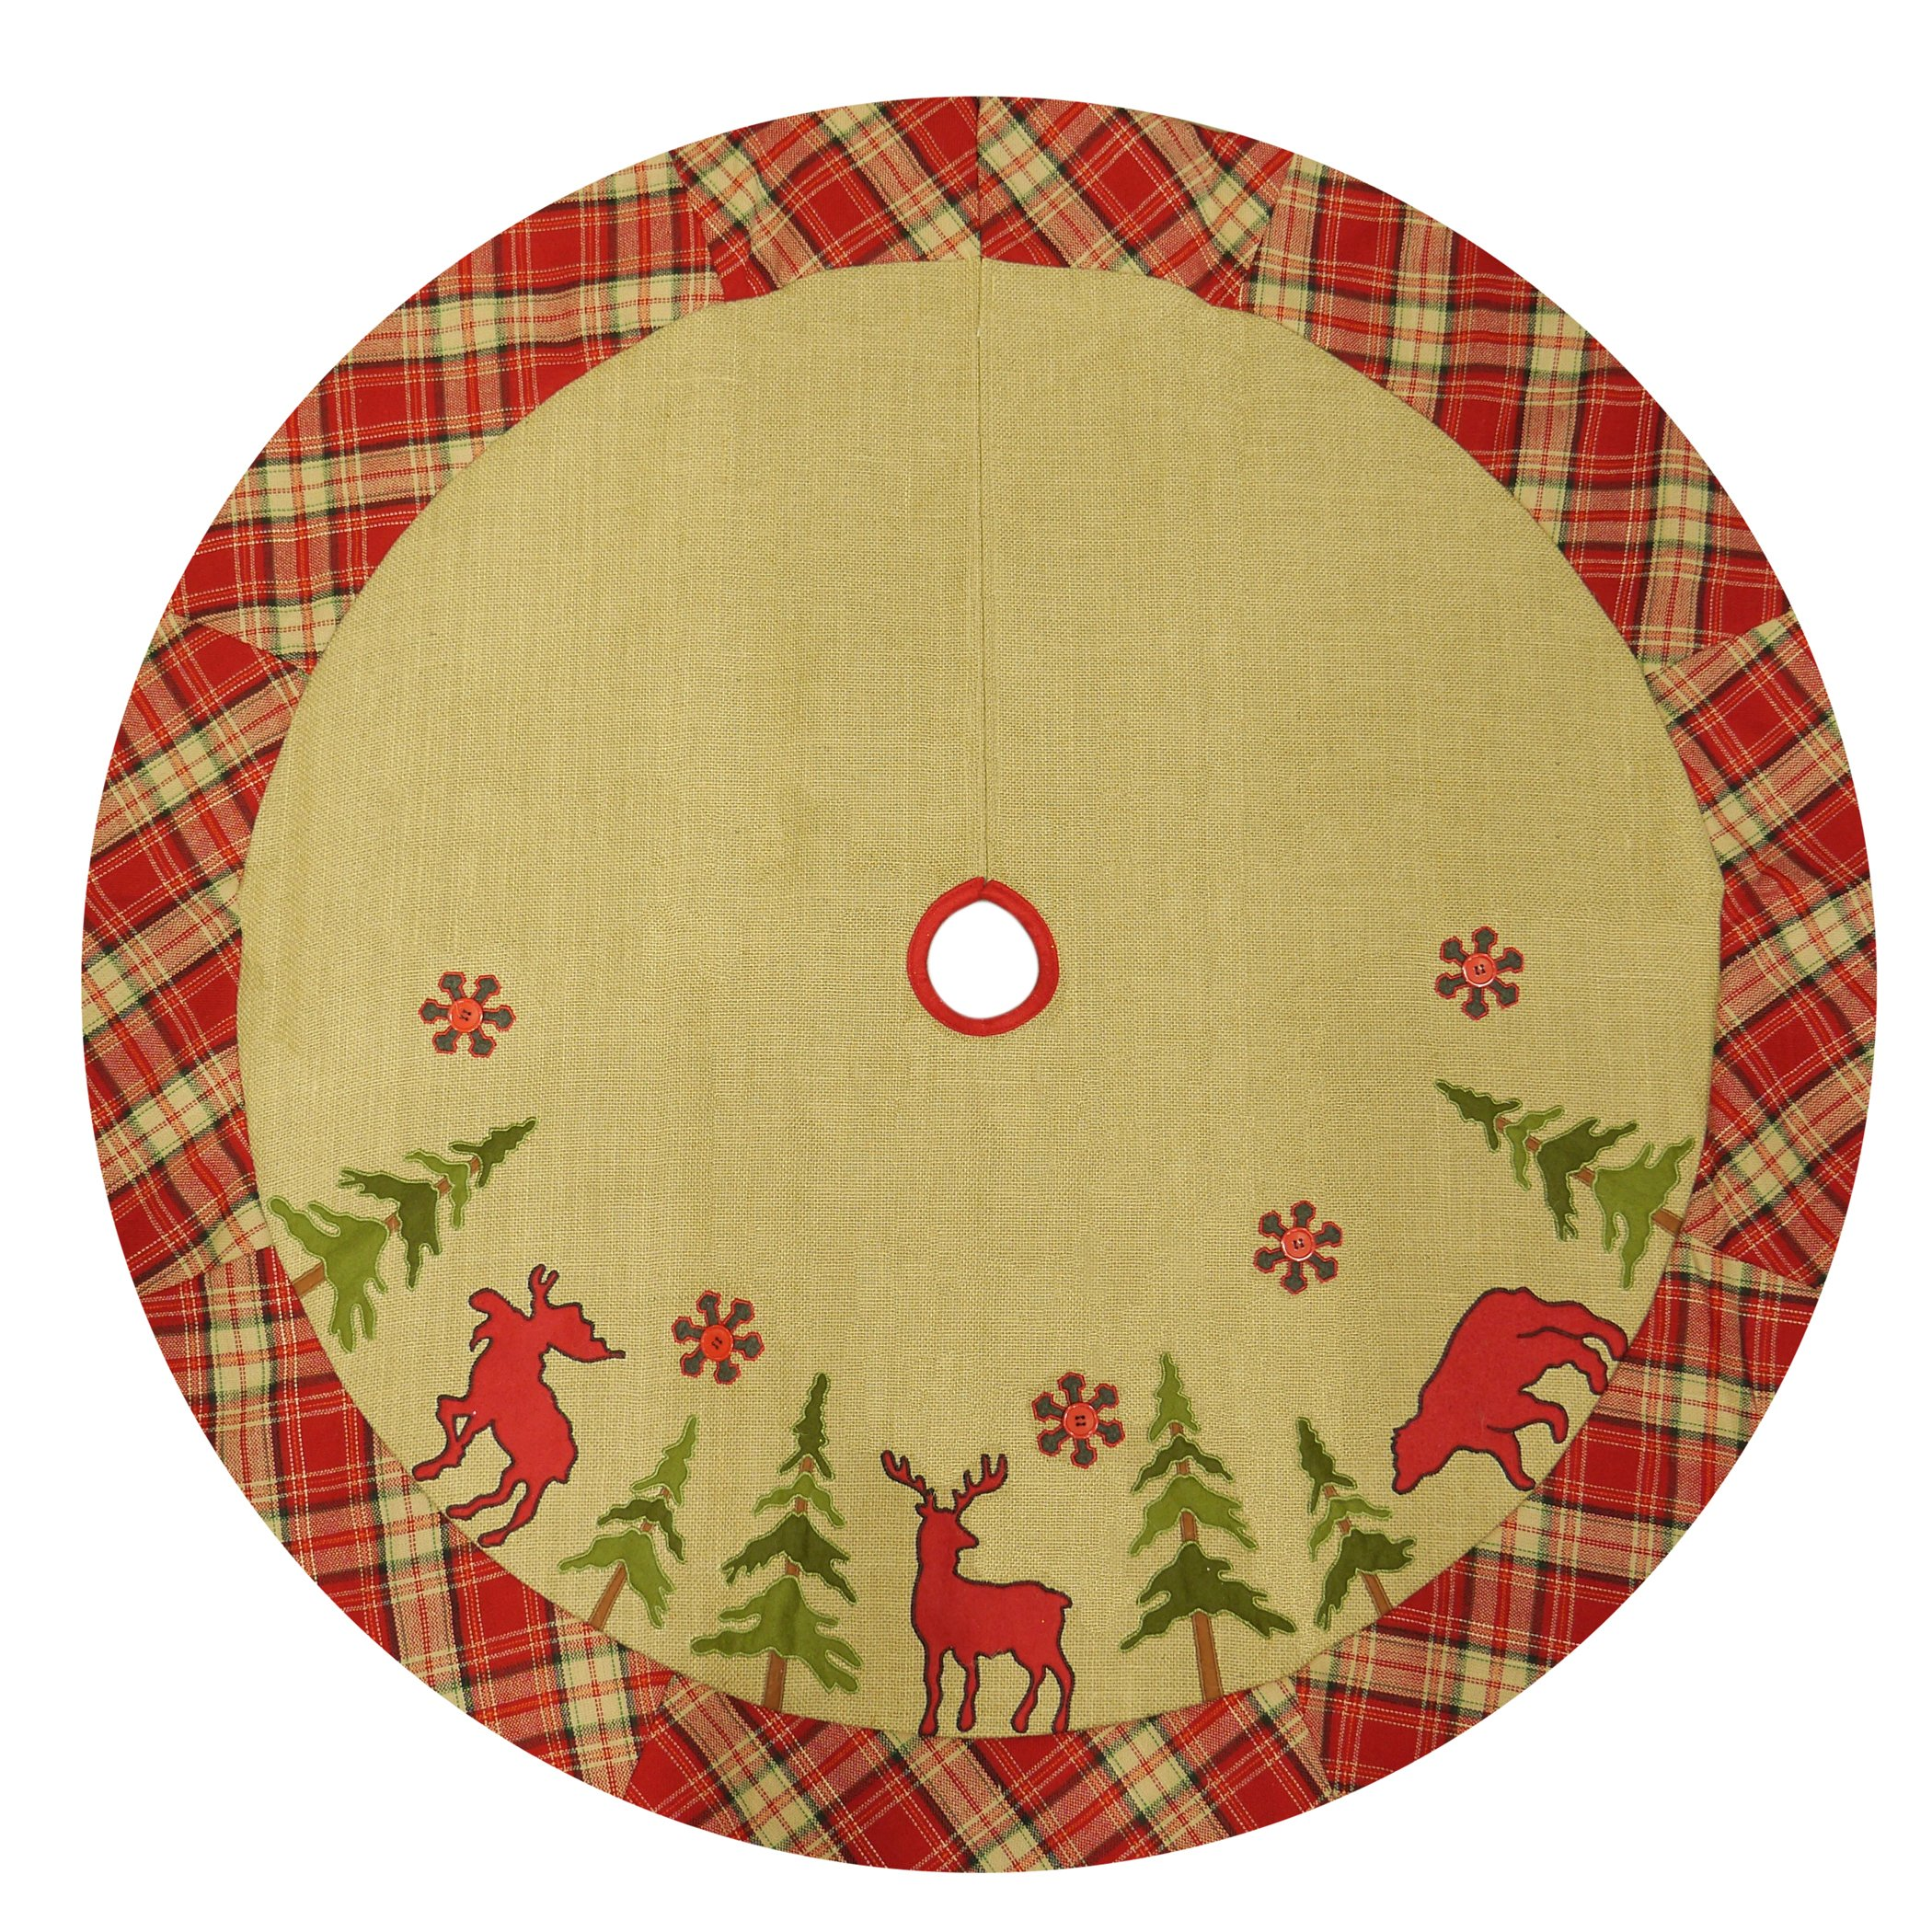 48'' Burlap Lodge Christmas Tree Skirt with Plaid Border, Applique & Embroidery, Moose/Deer/Bear